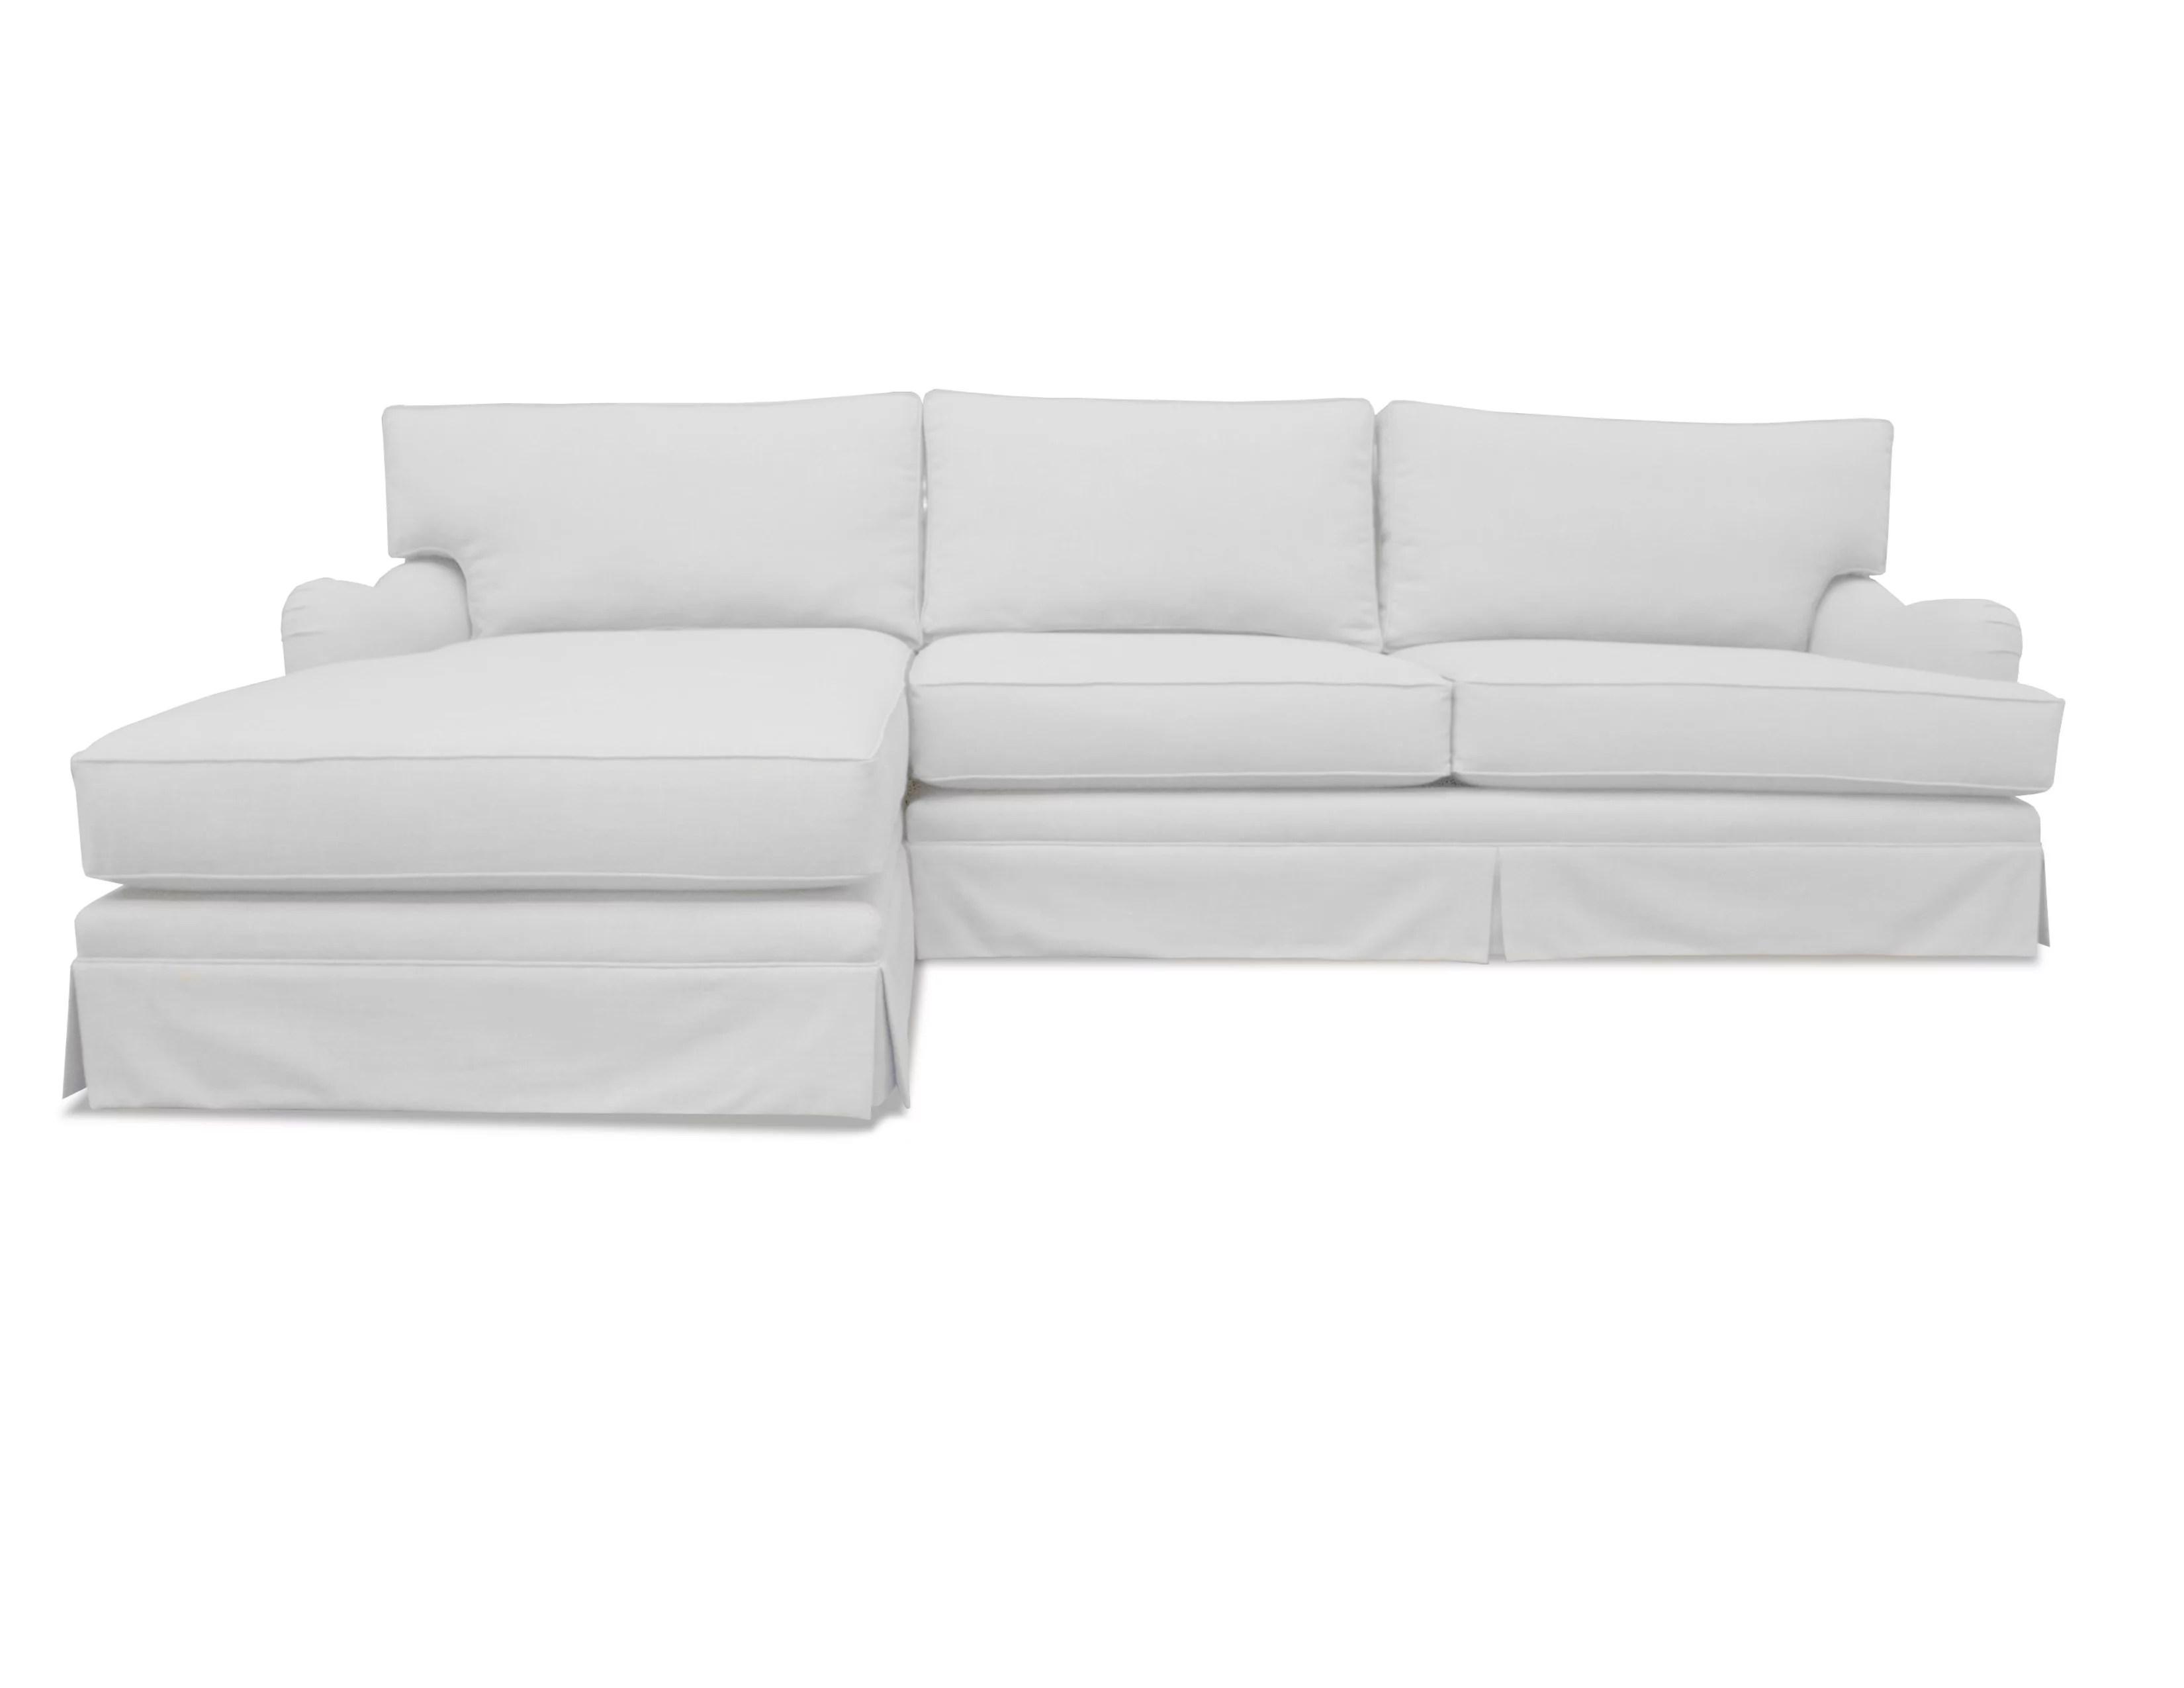 sectional sofas boston design sofa set pictures south cone home walmart com